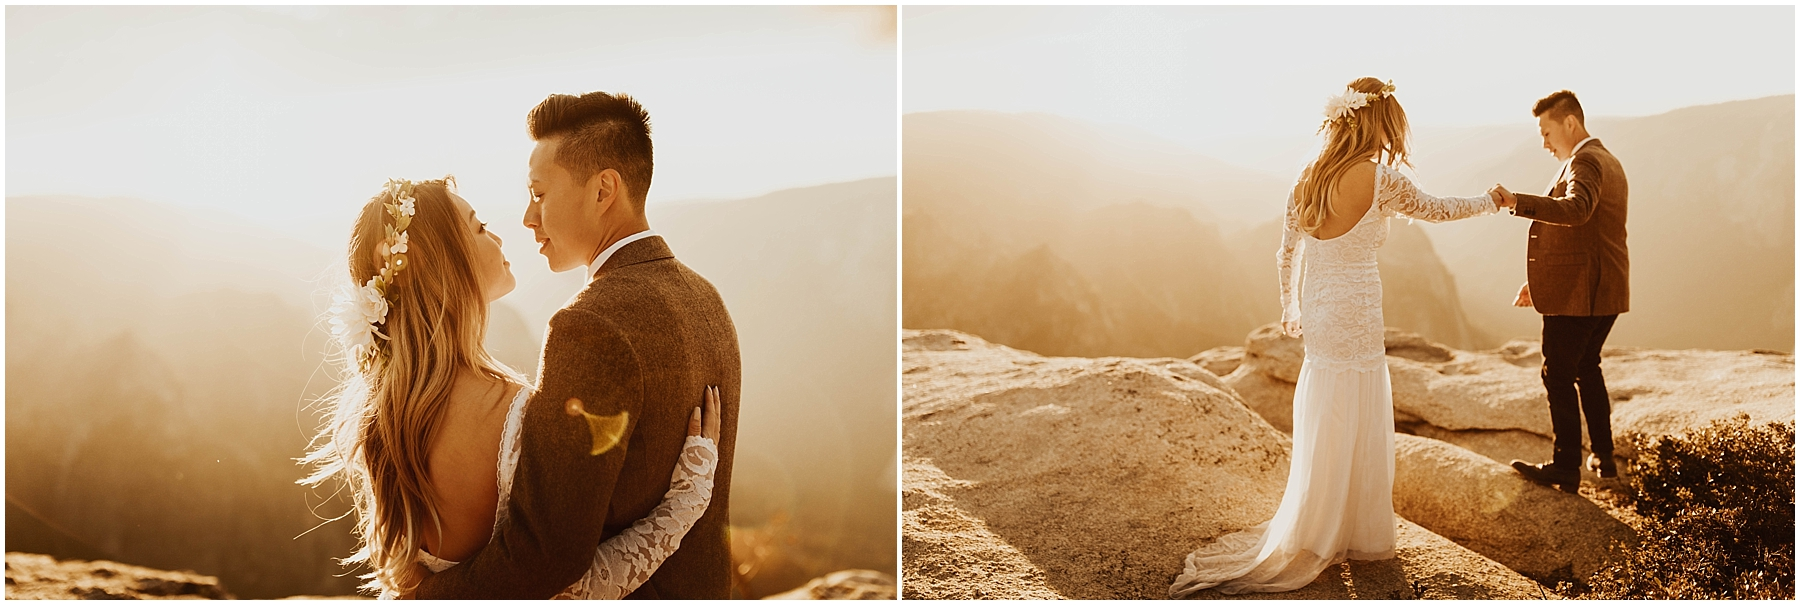 Yosemite_elopement_0093.jpg